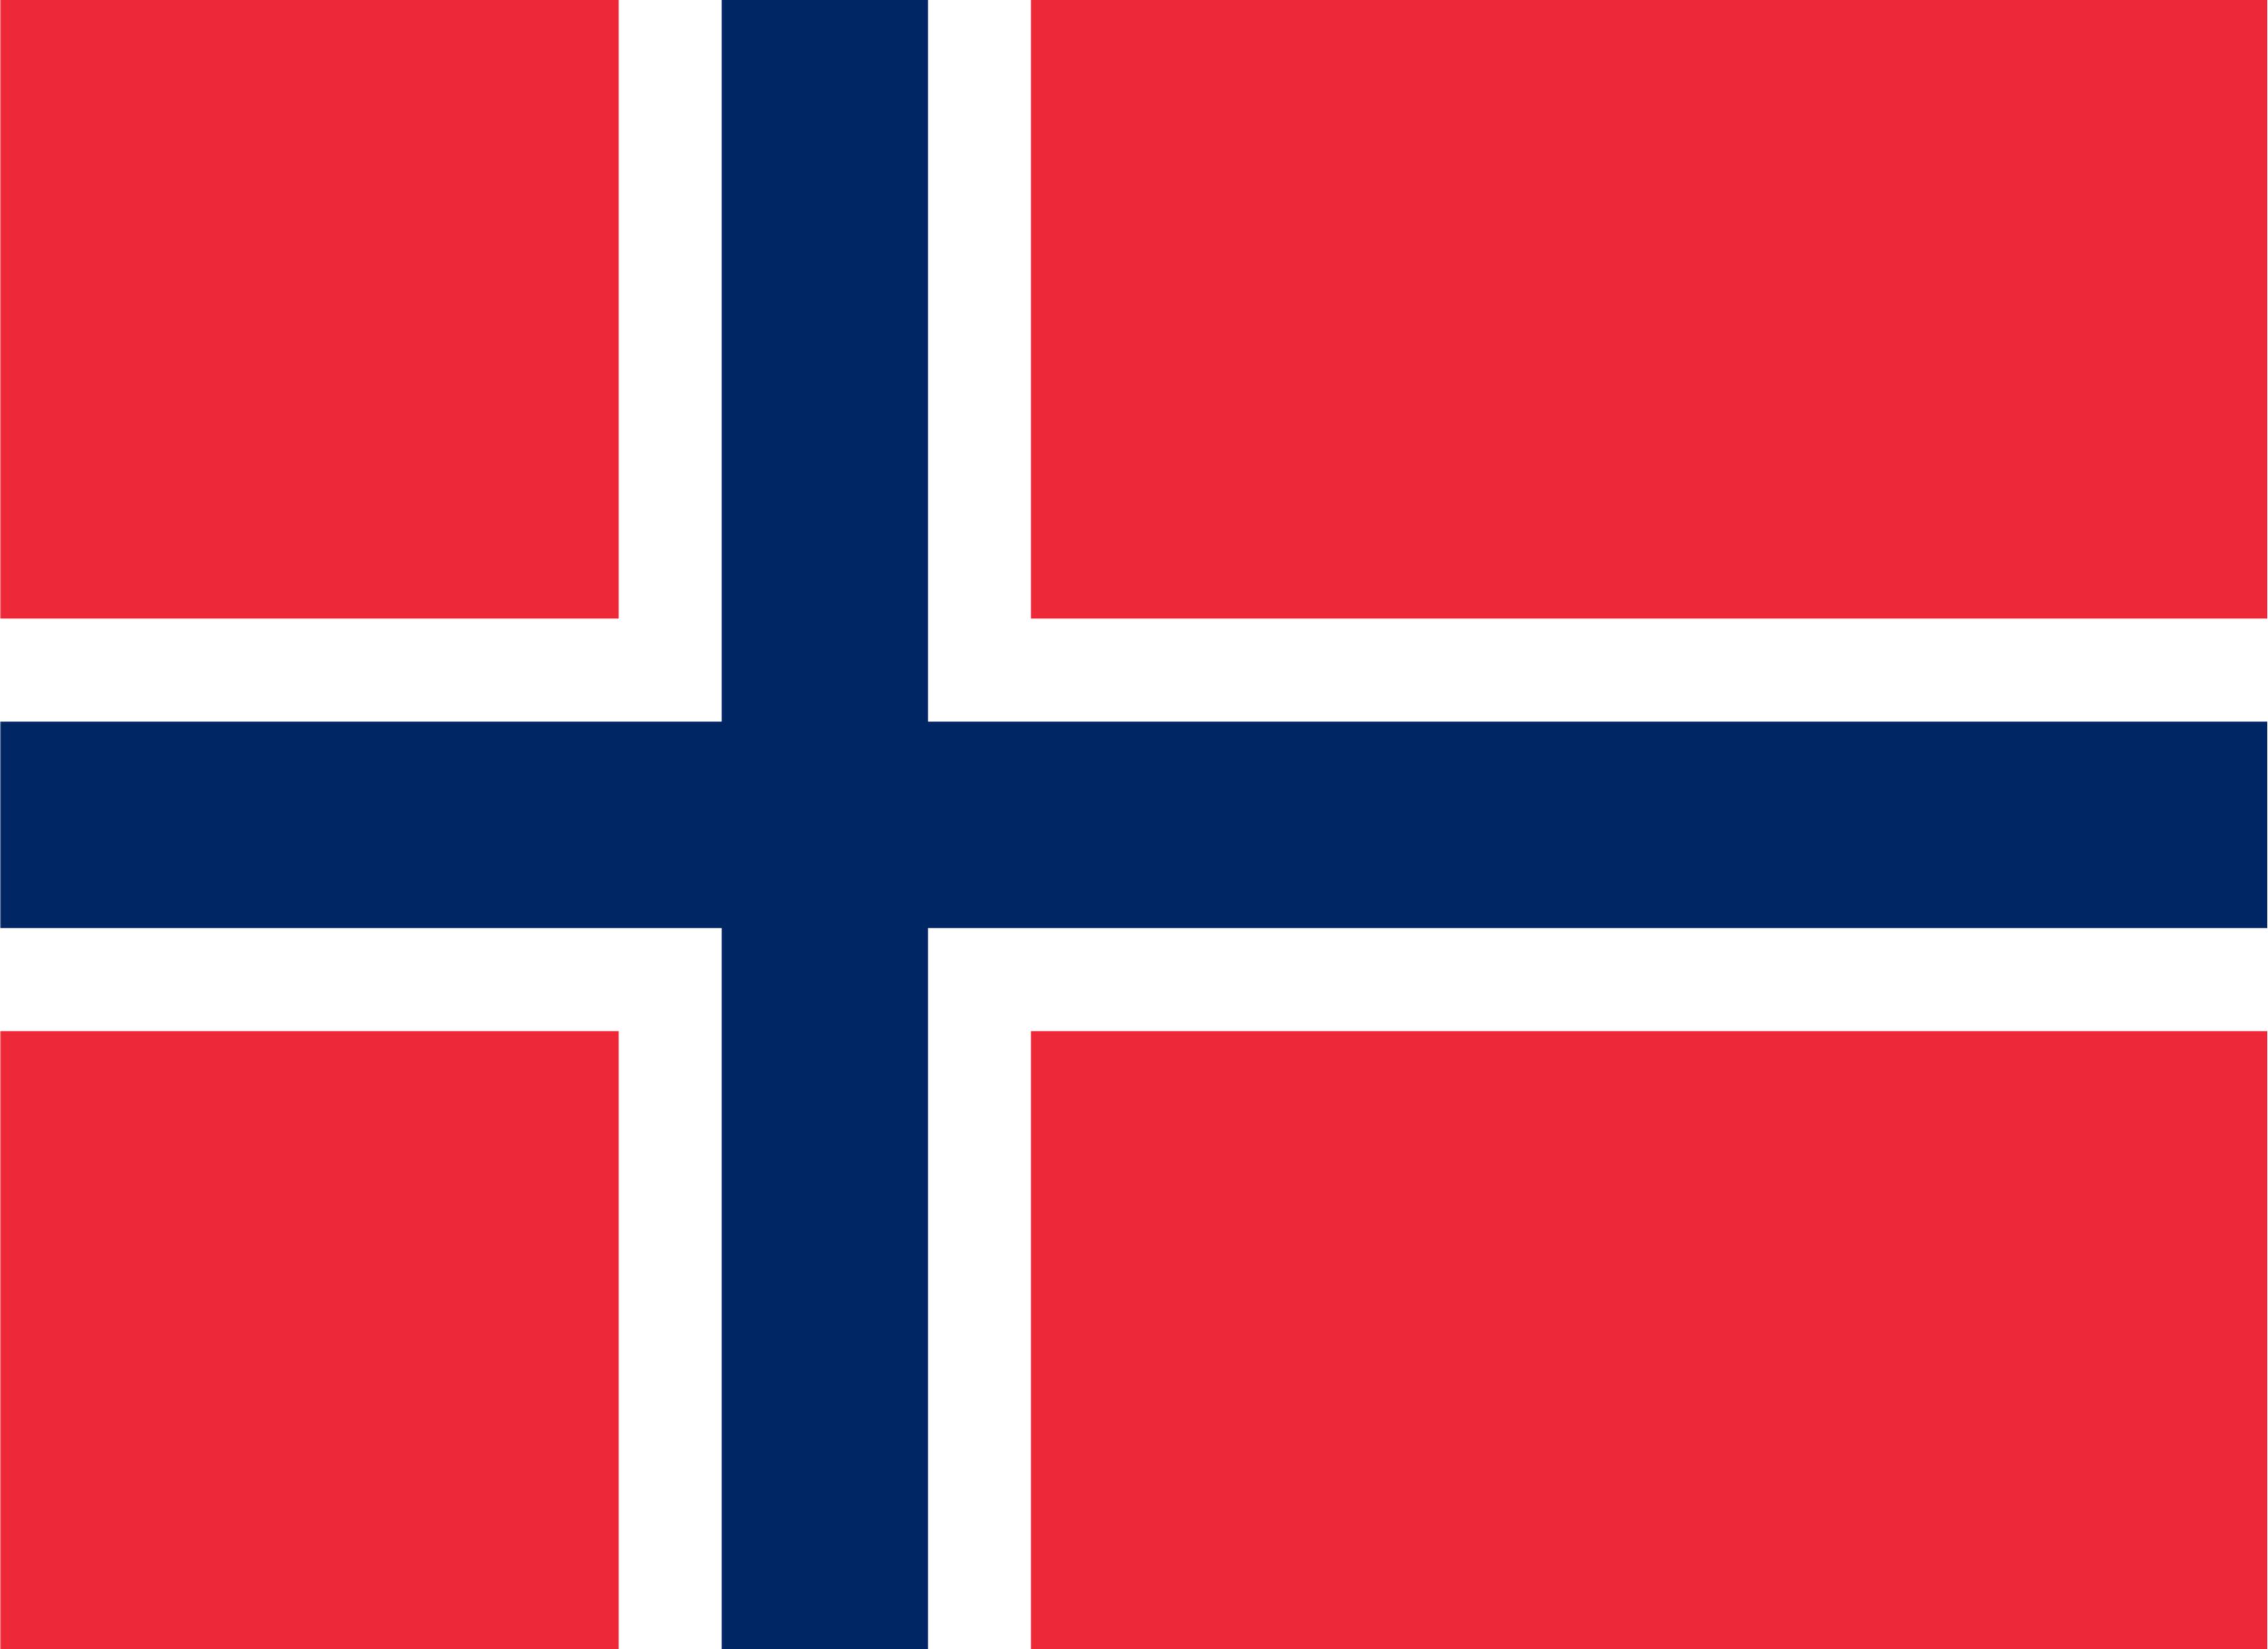 Flag of Bouvet Island